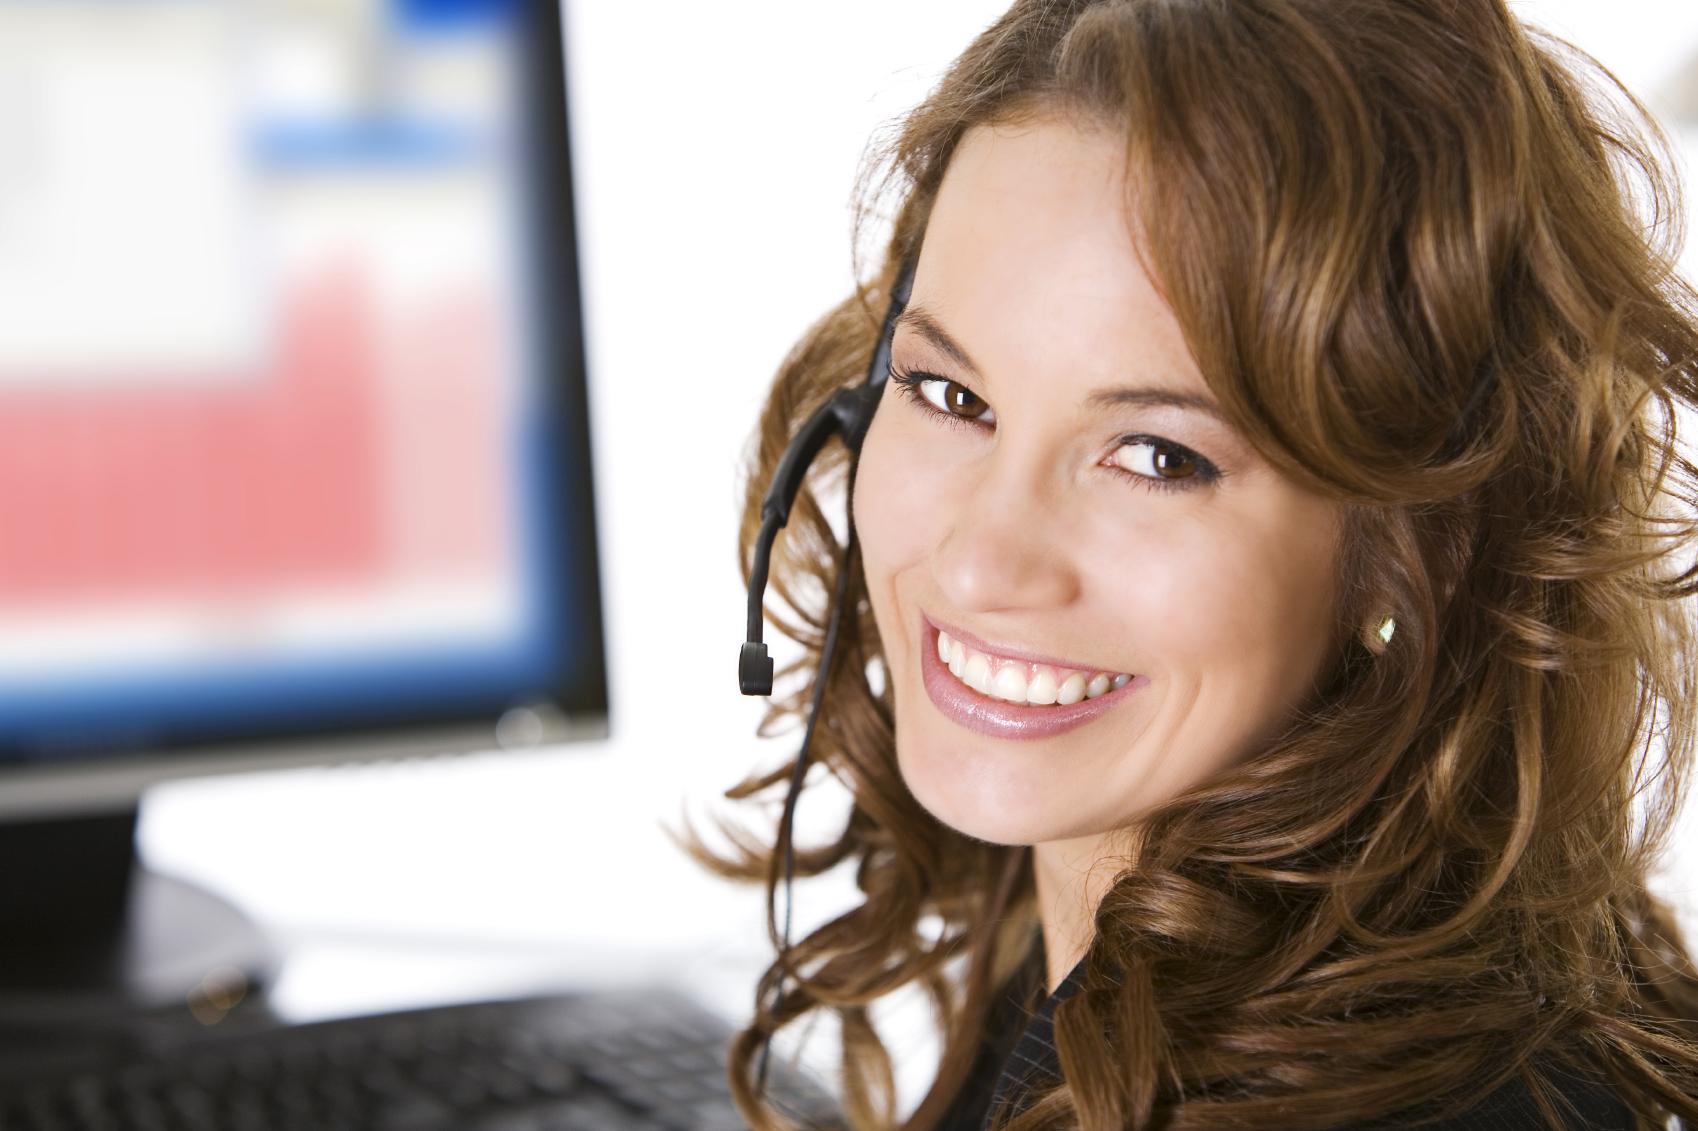 Customer Services Call Center